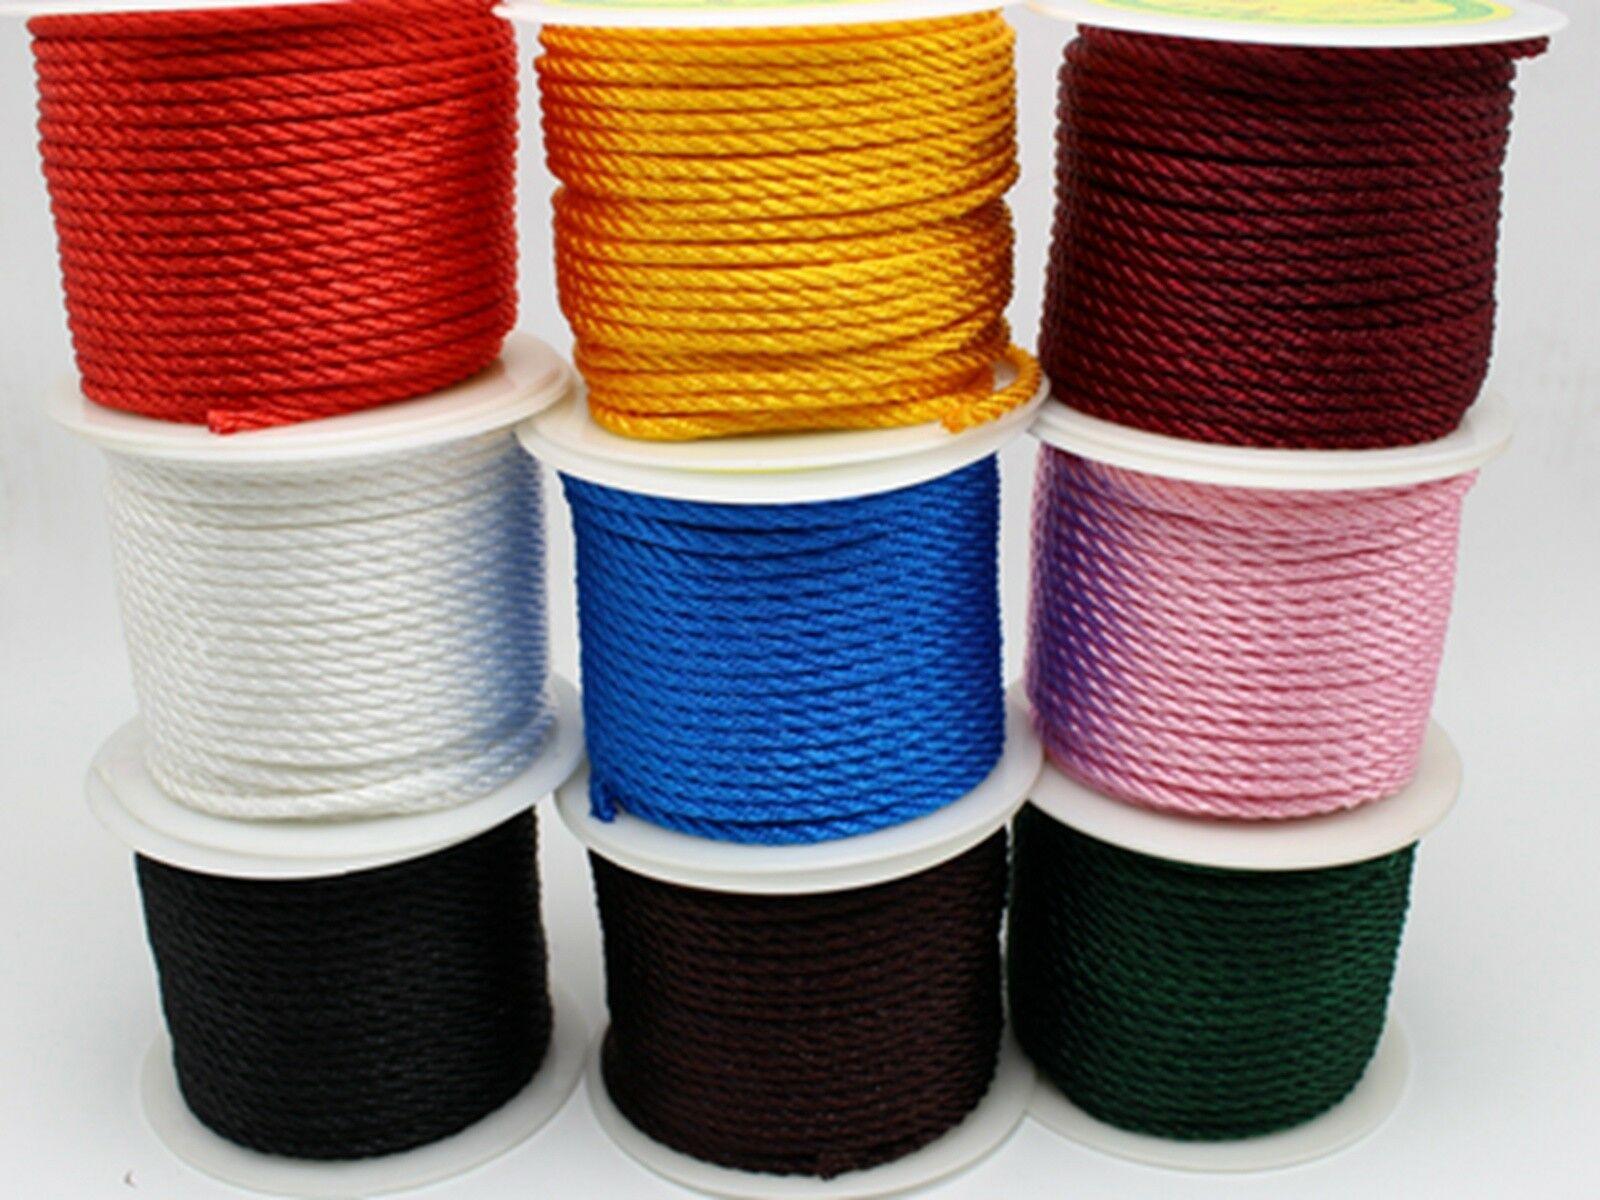 16.4 Feets 3mm Nylon String Chinese Satin Silk Braided Cord Love Binding Rope